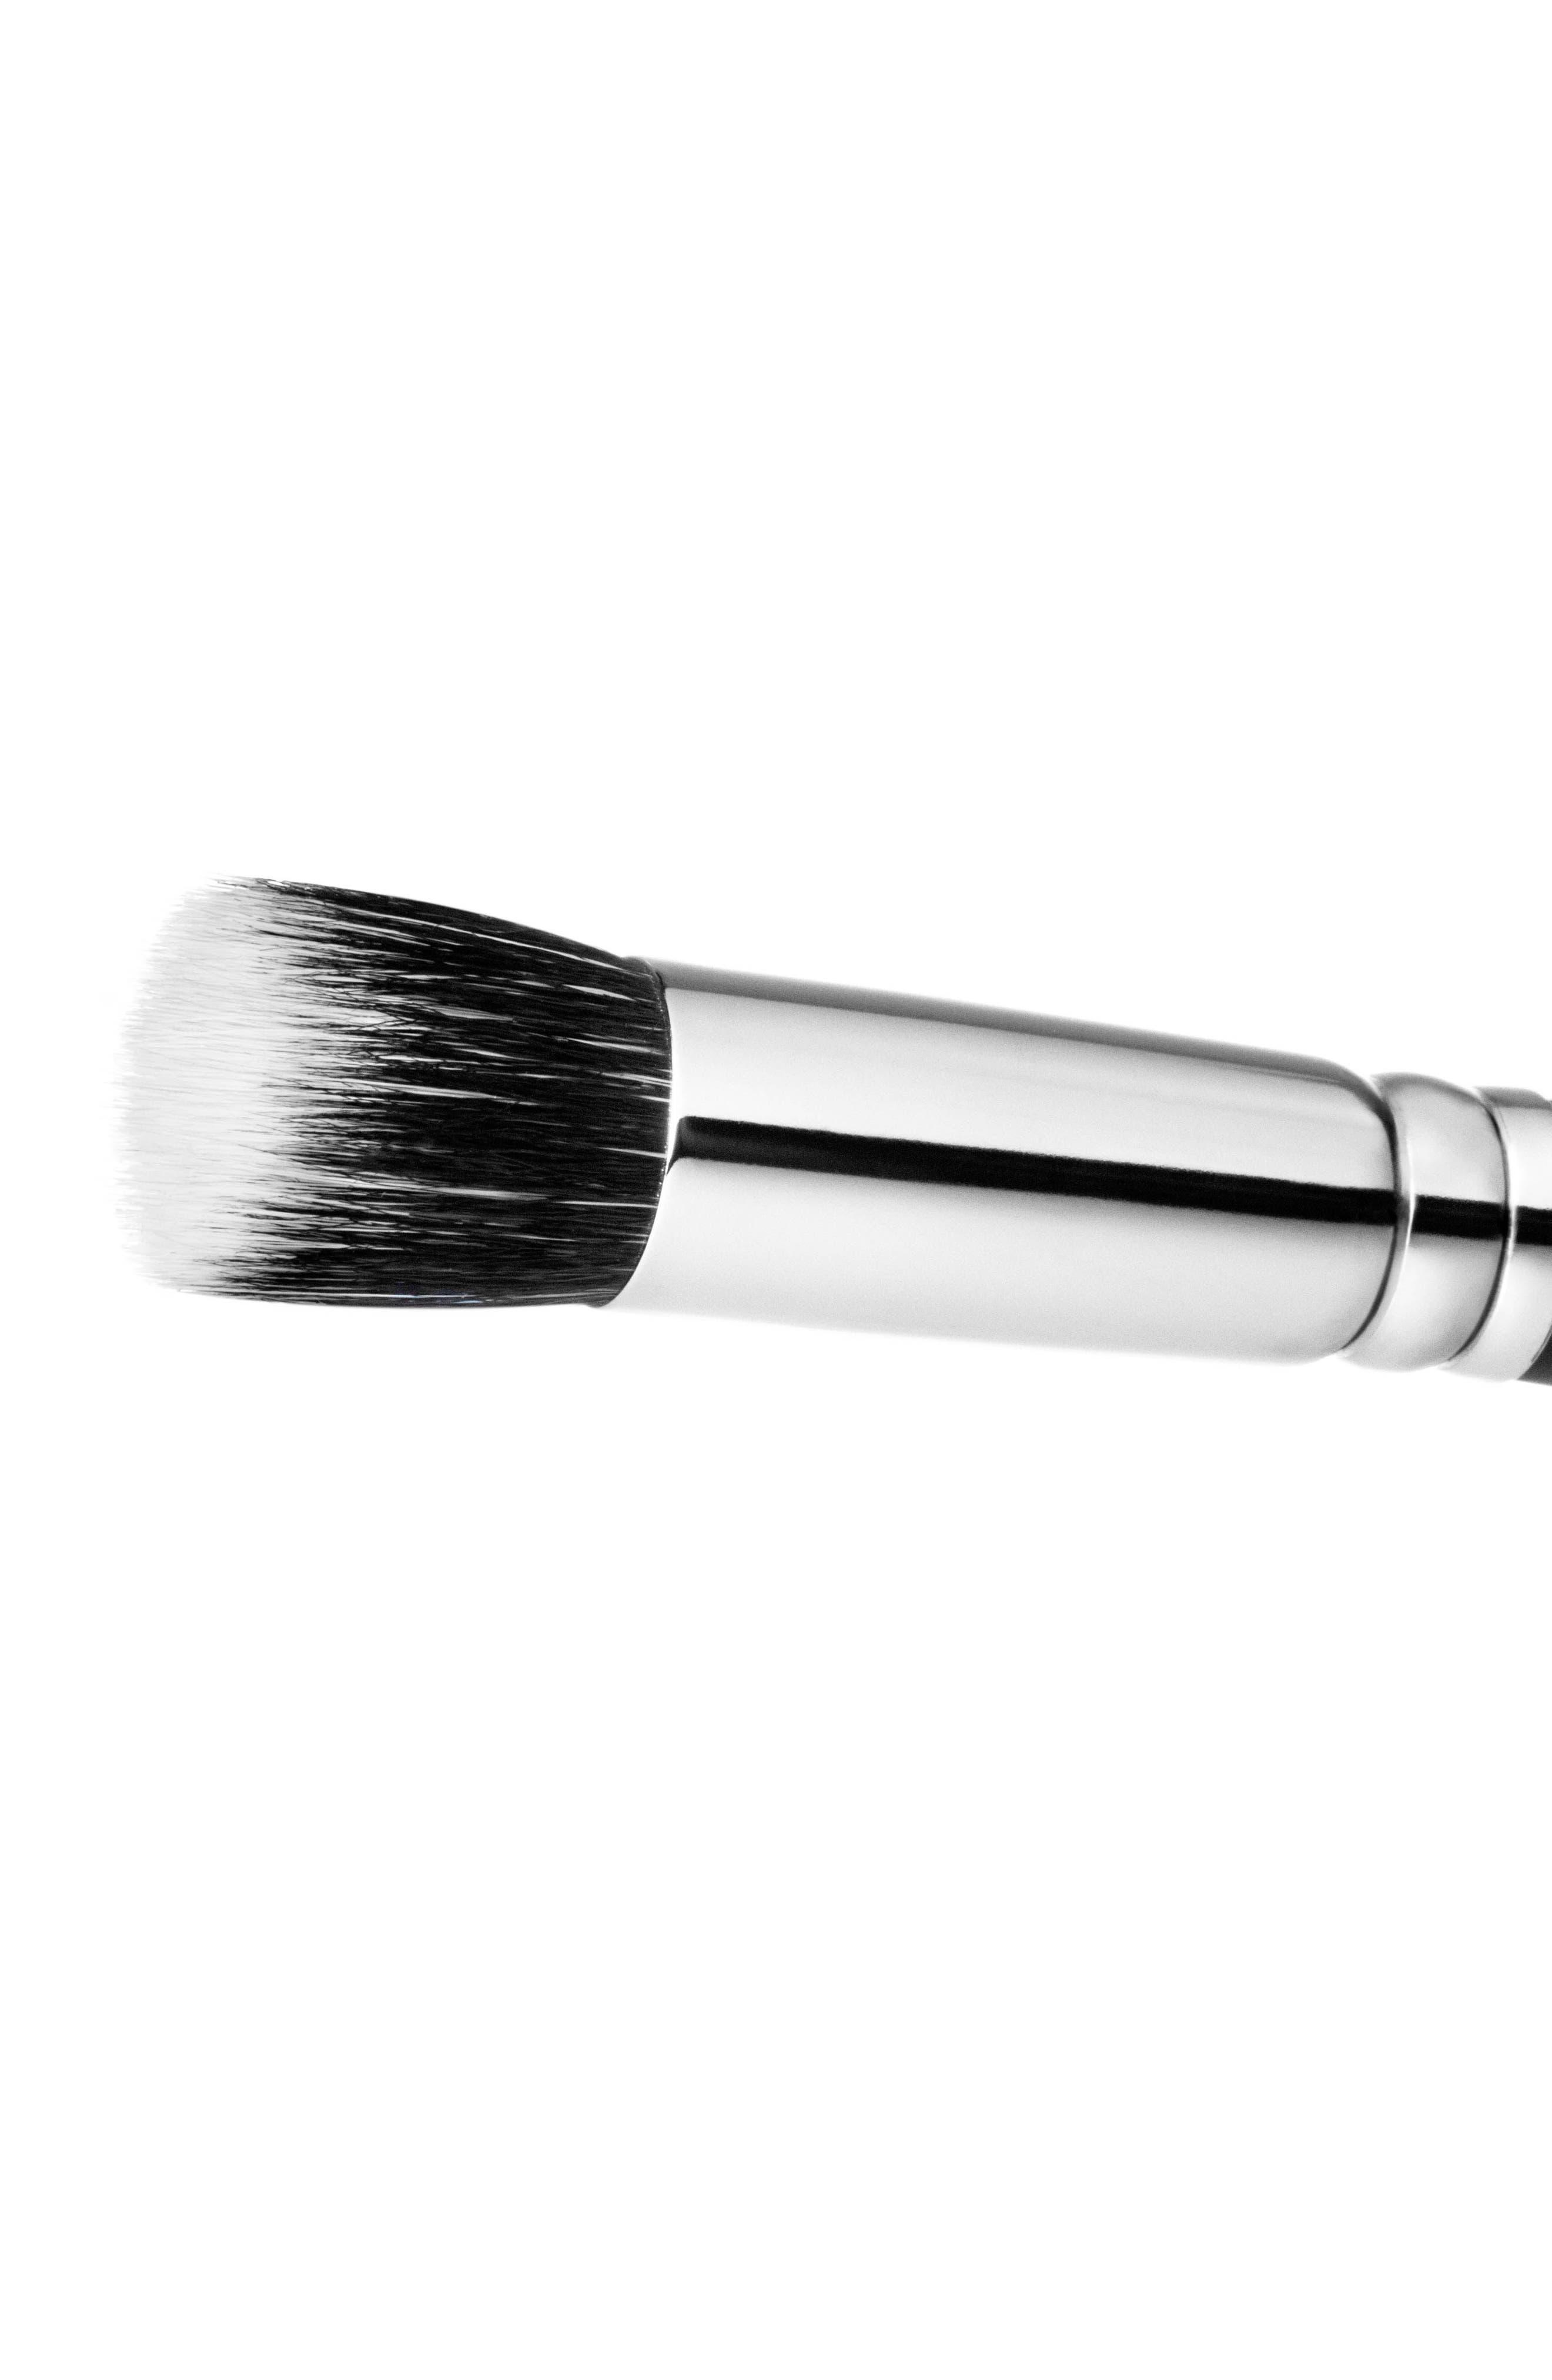 MAC 130S Synthetic Short Duo Fibre Brush,                             Alternate thumbnail 3, color,                             No Color